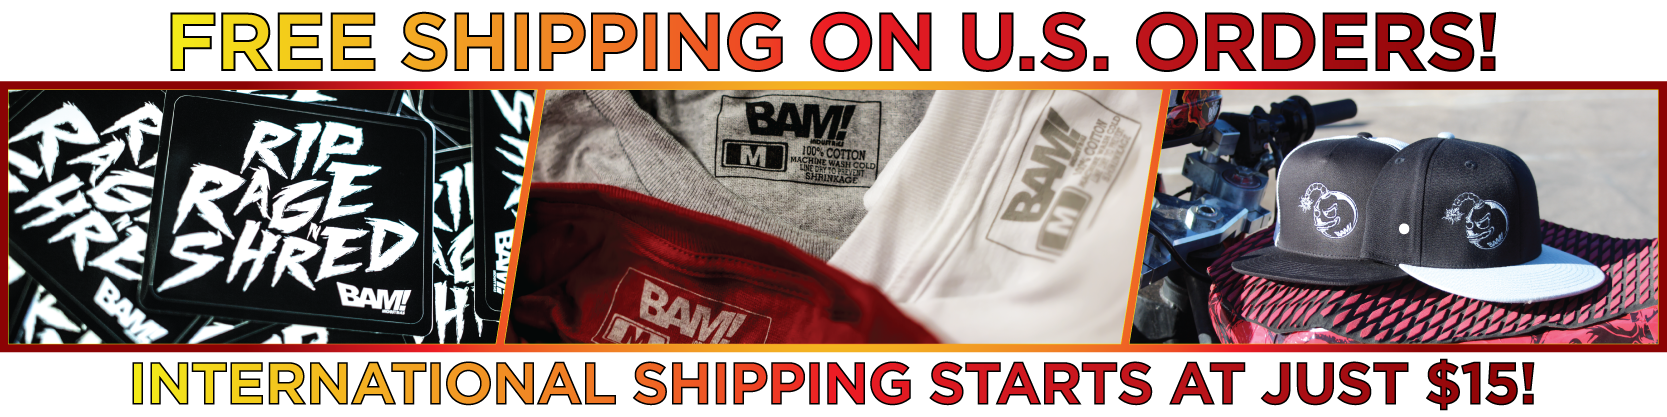 Bam Shop Banner